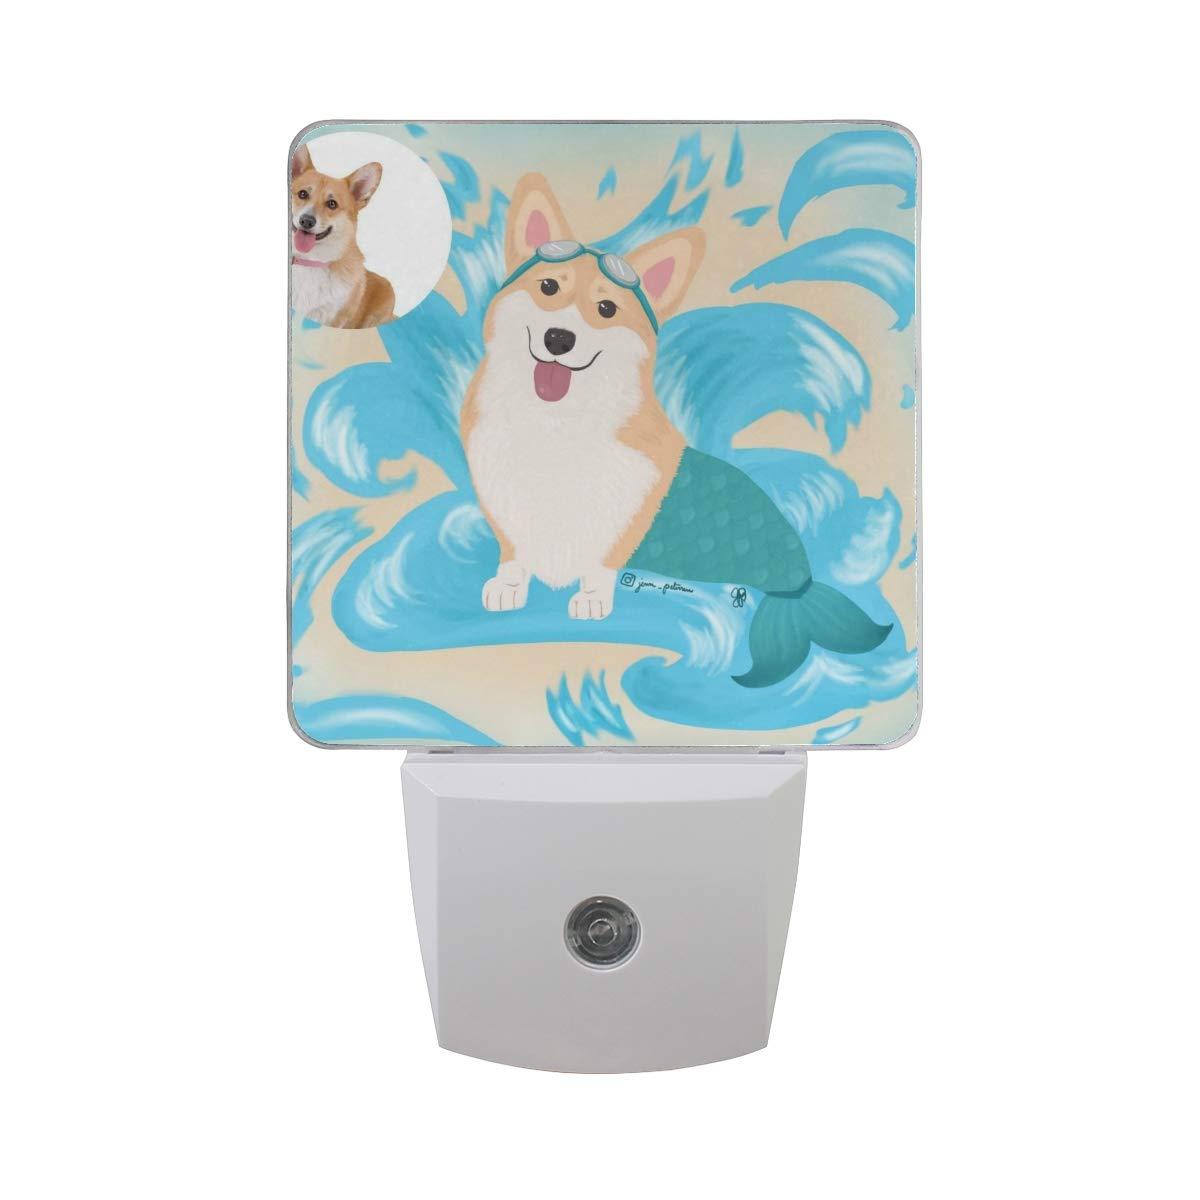 Night Light Corgi Pet Mermaid Led Light Lamp for Hallway, Kitchen, Bathroom, Bedroom, Stairs, DaylightWhite, Bedroom, Compact